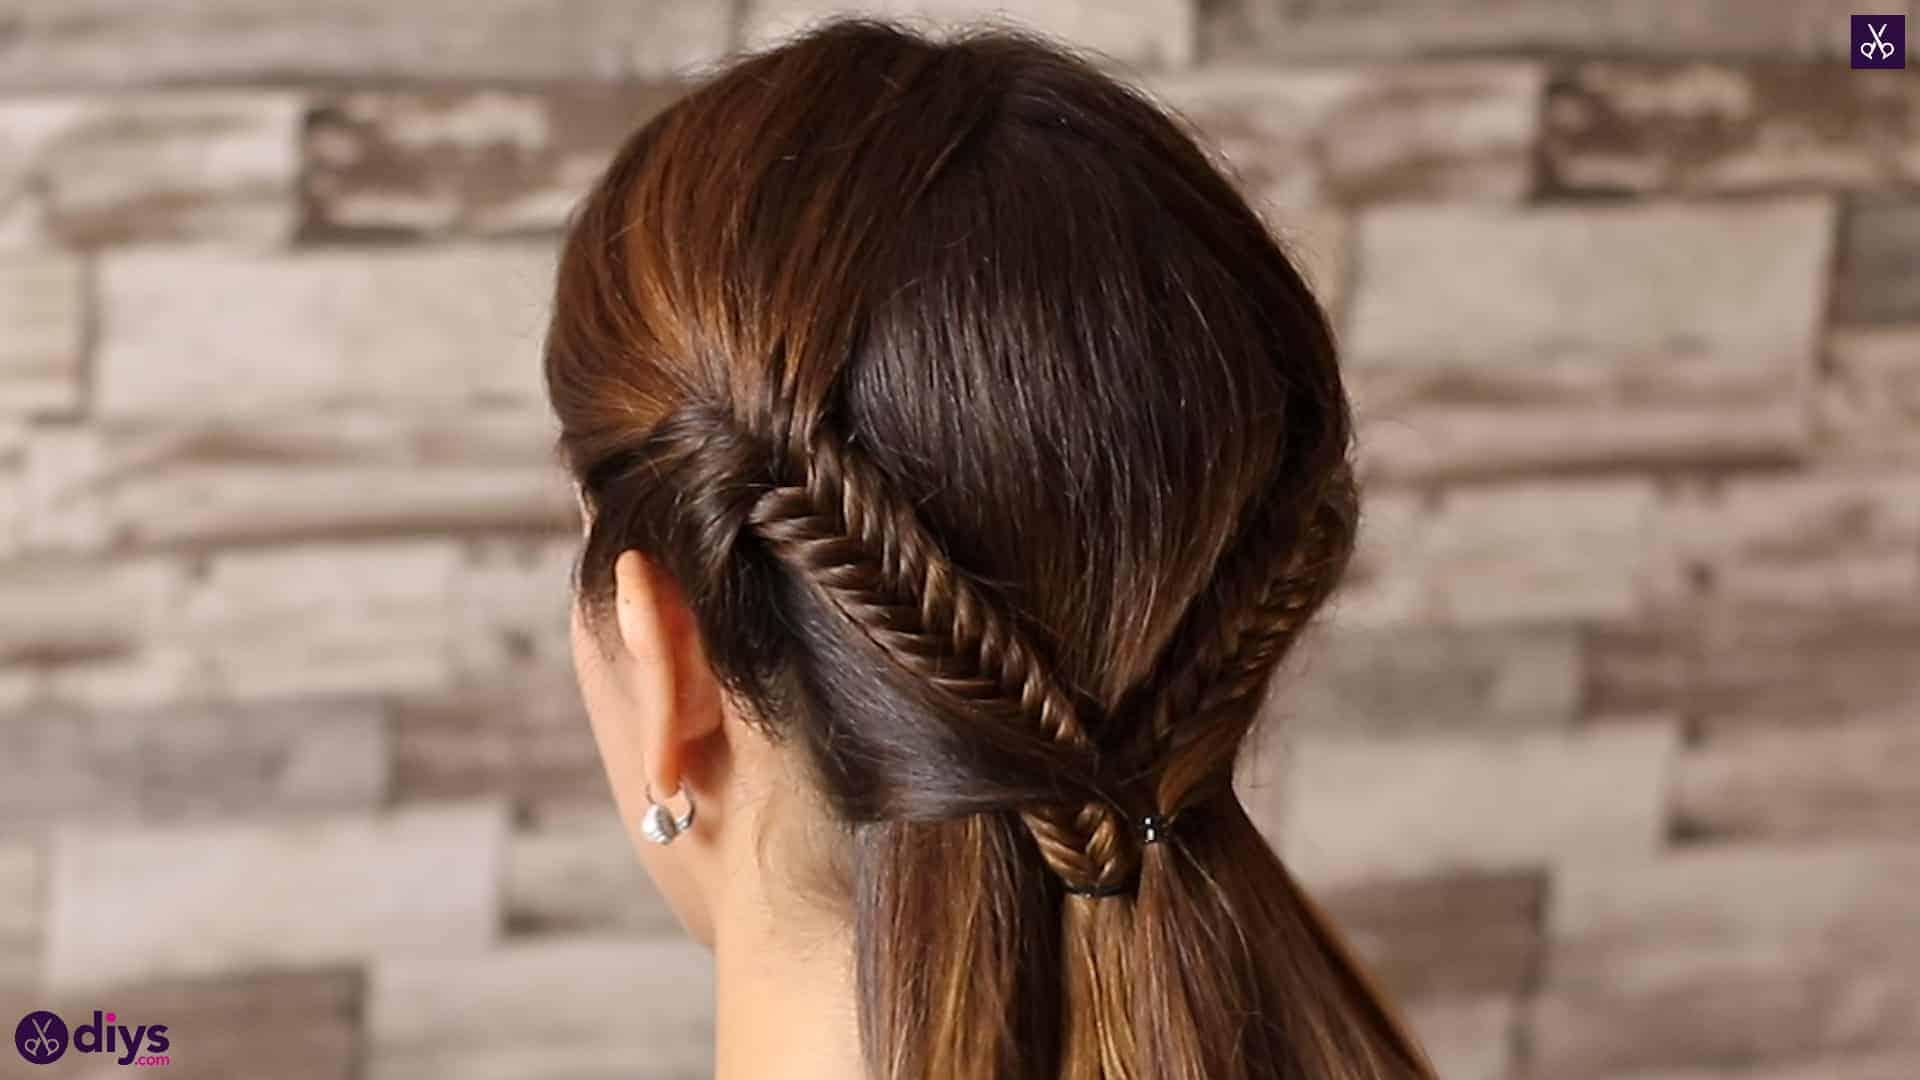 Romantic prom hairstyle tutorial step 3c